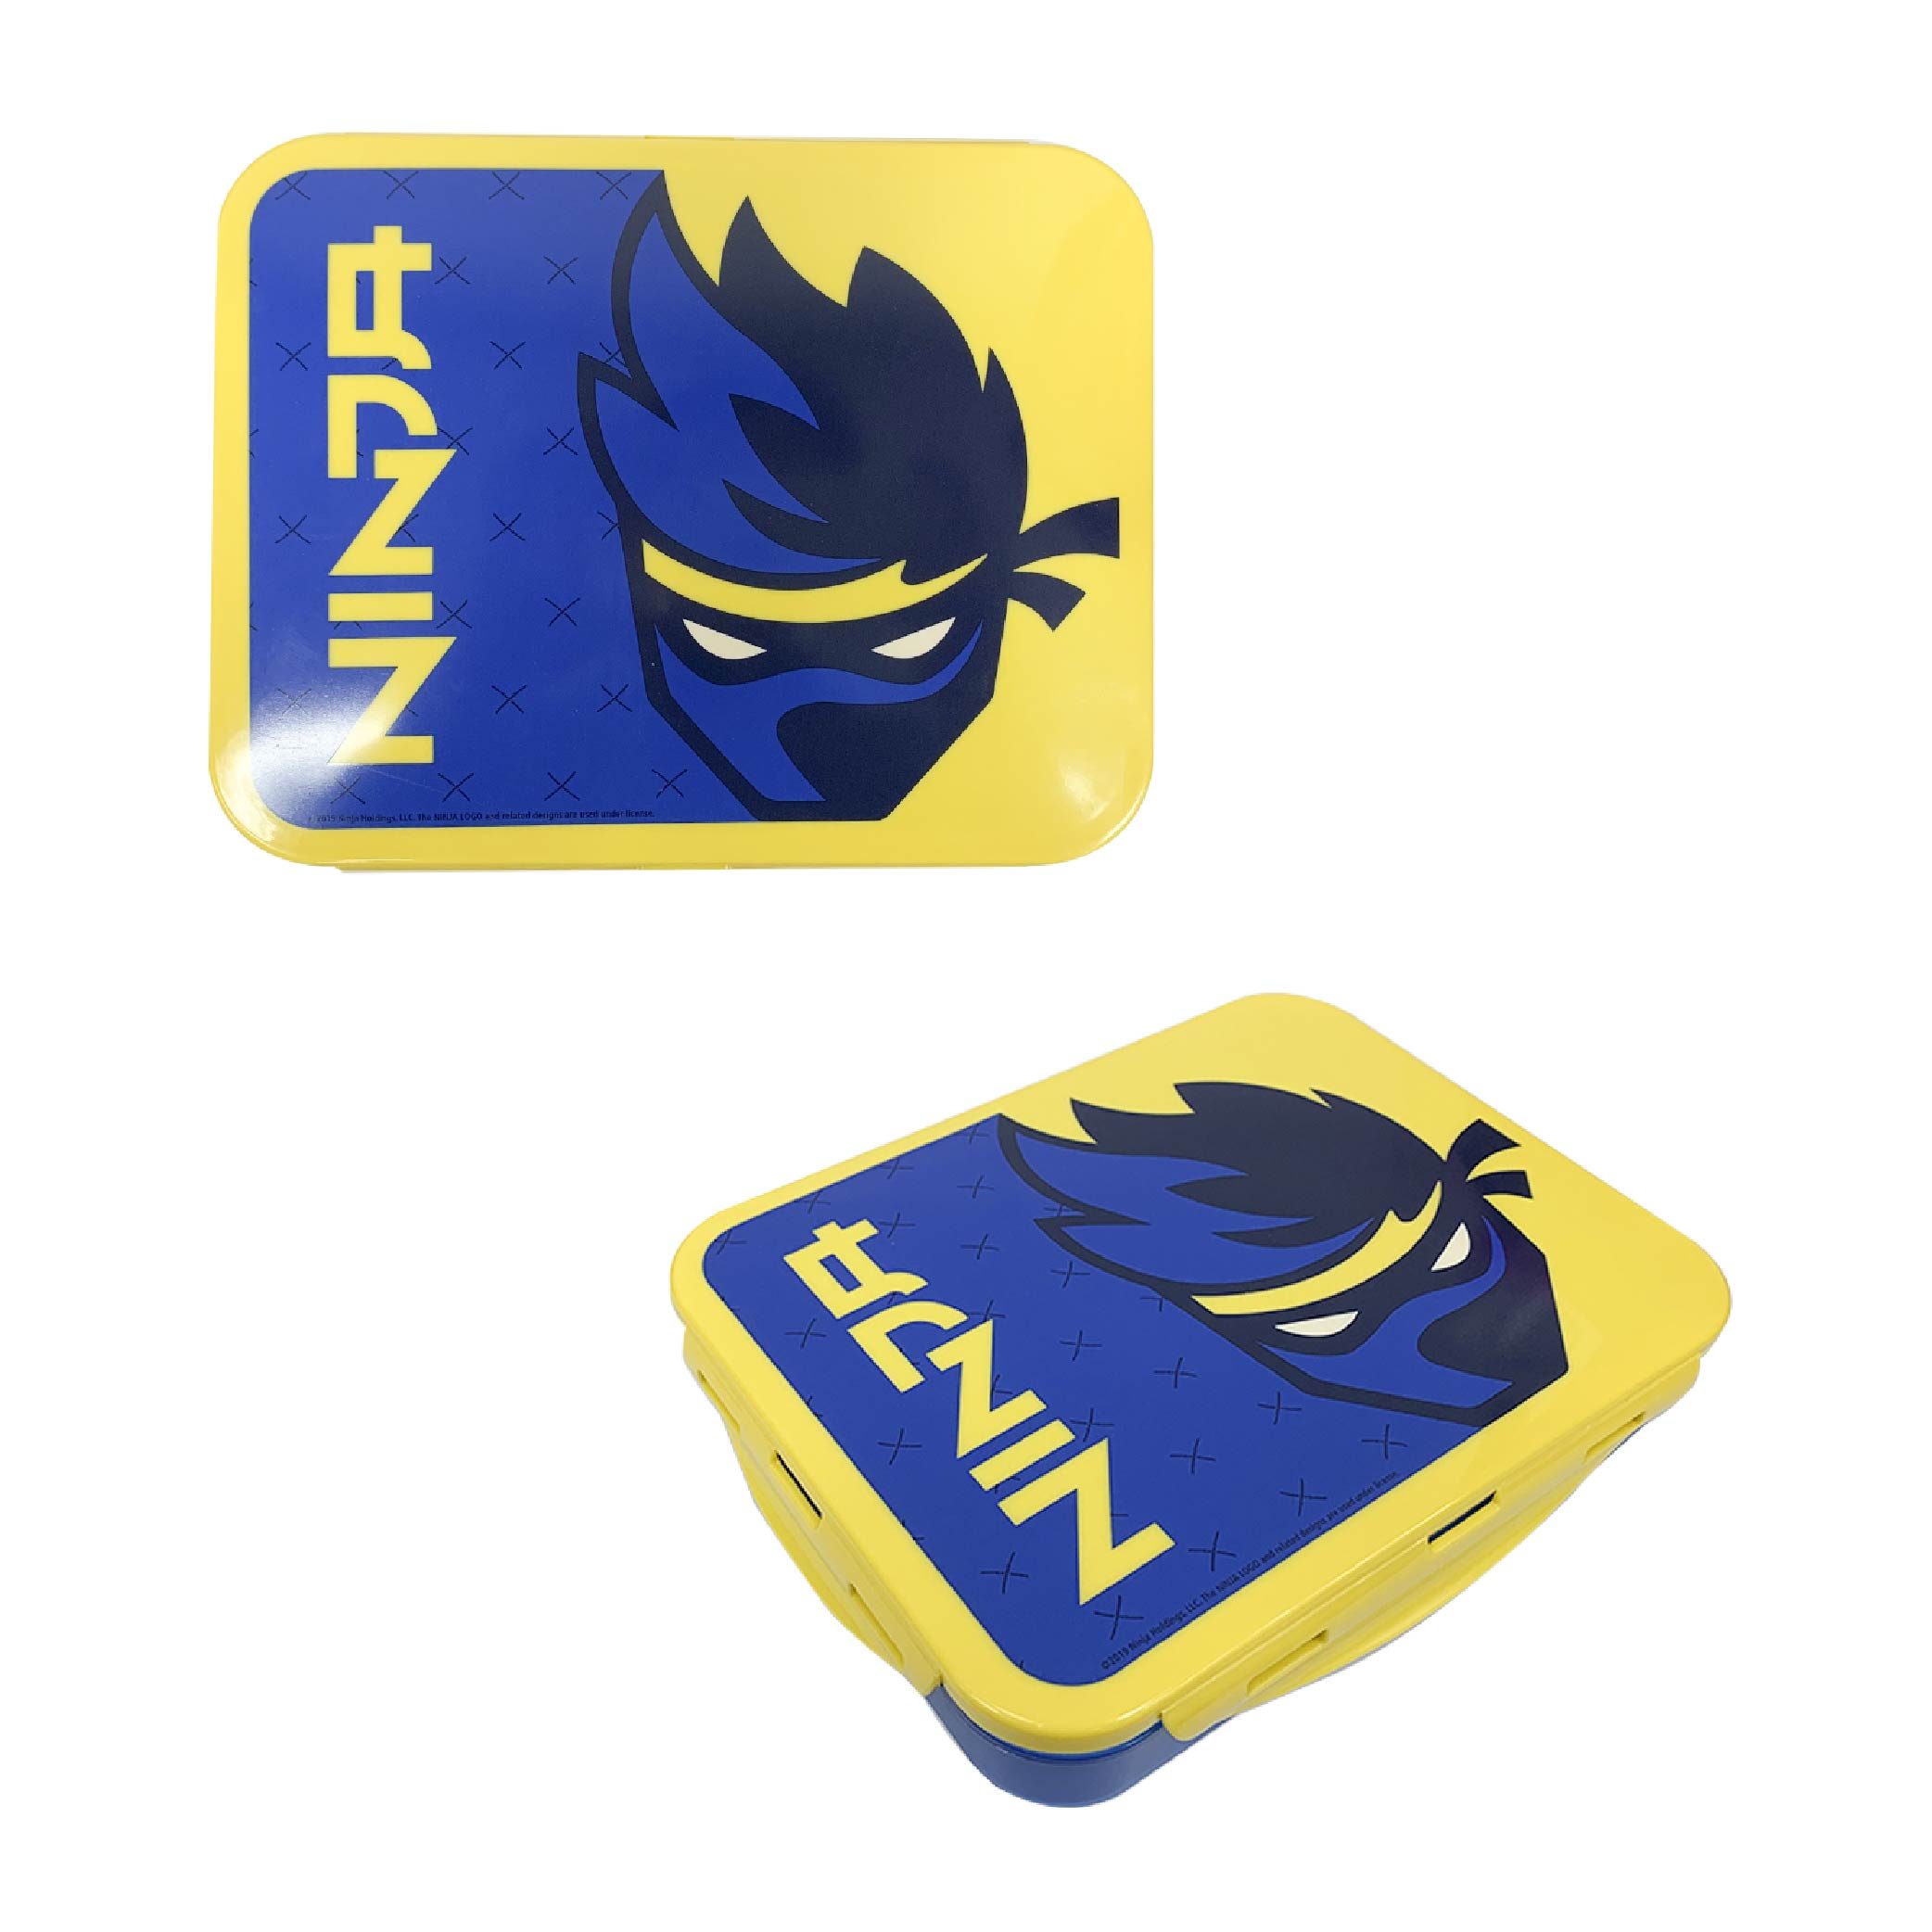 Ninja 3-section Reusable Bento Boxes, Video Games, 2-piece set slideshow image 7